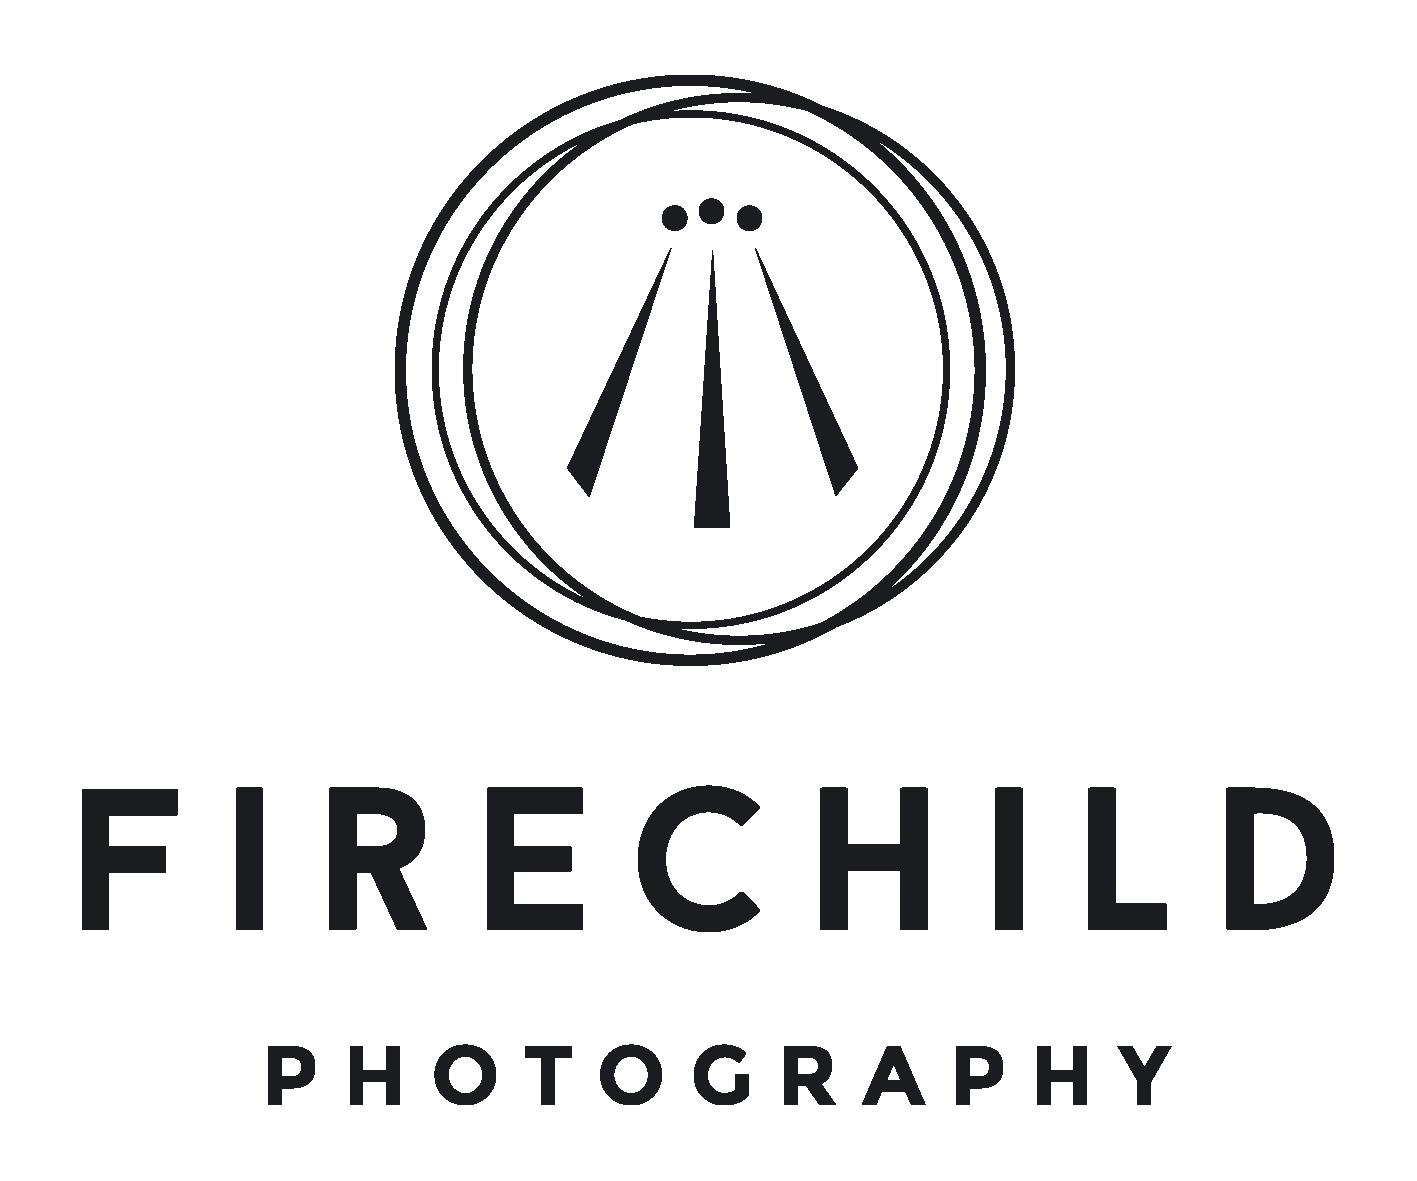 firechildphotography.com